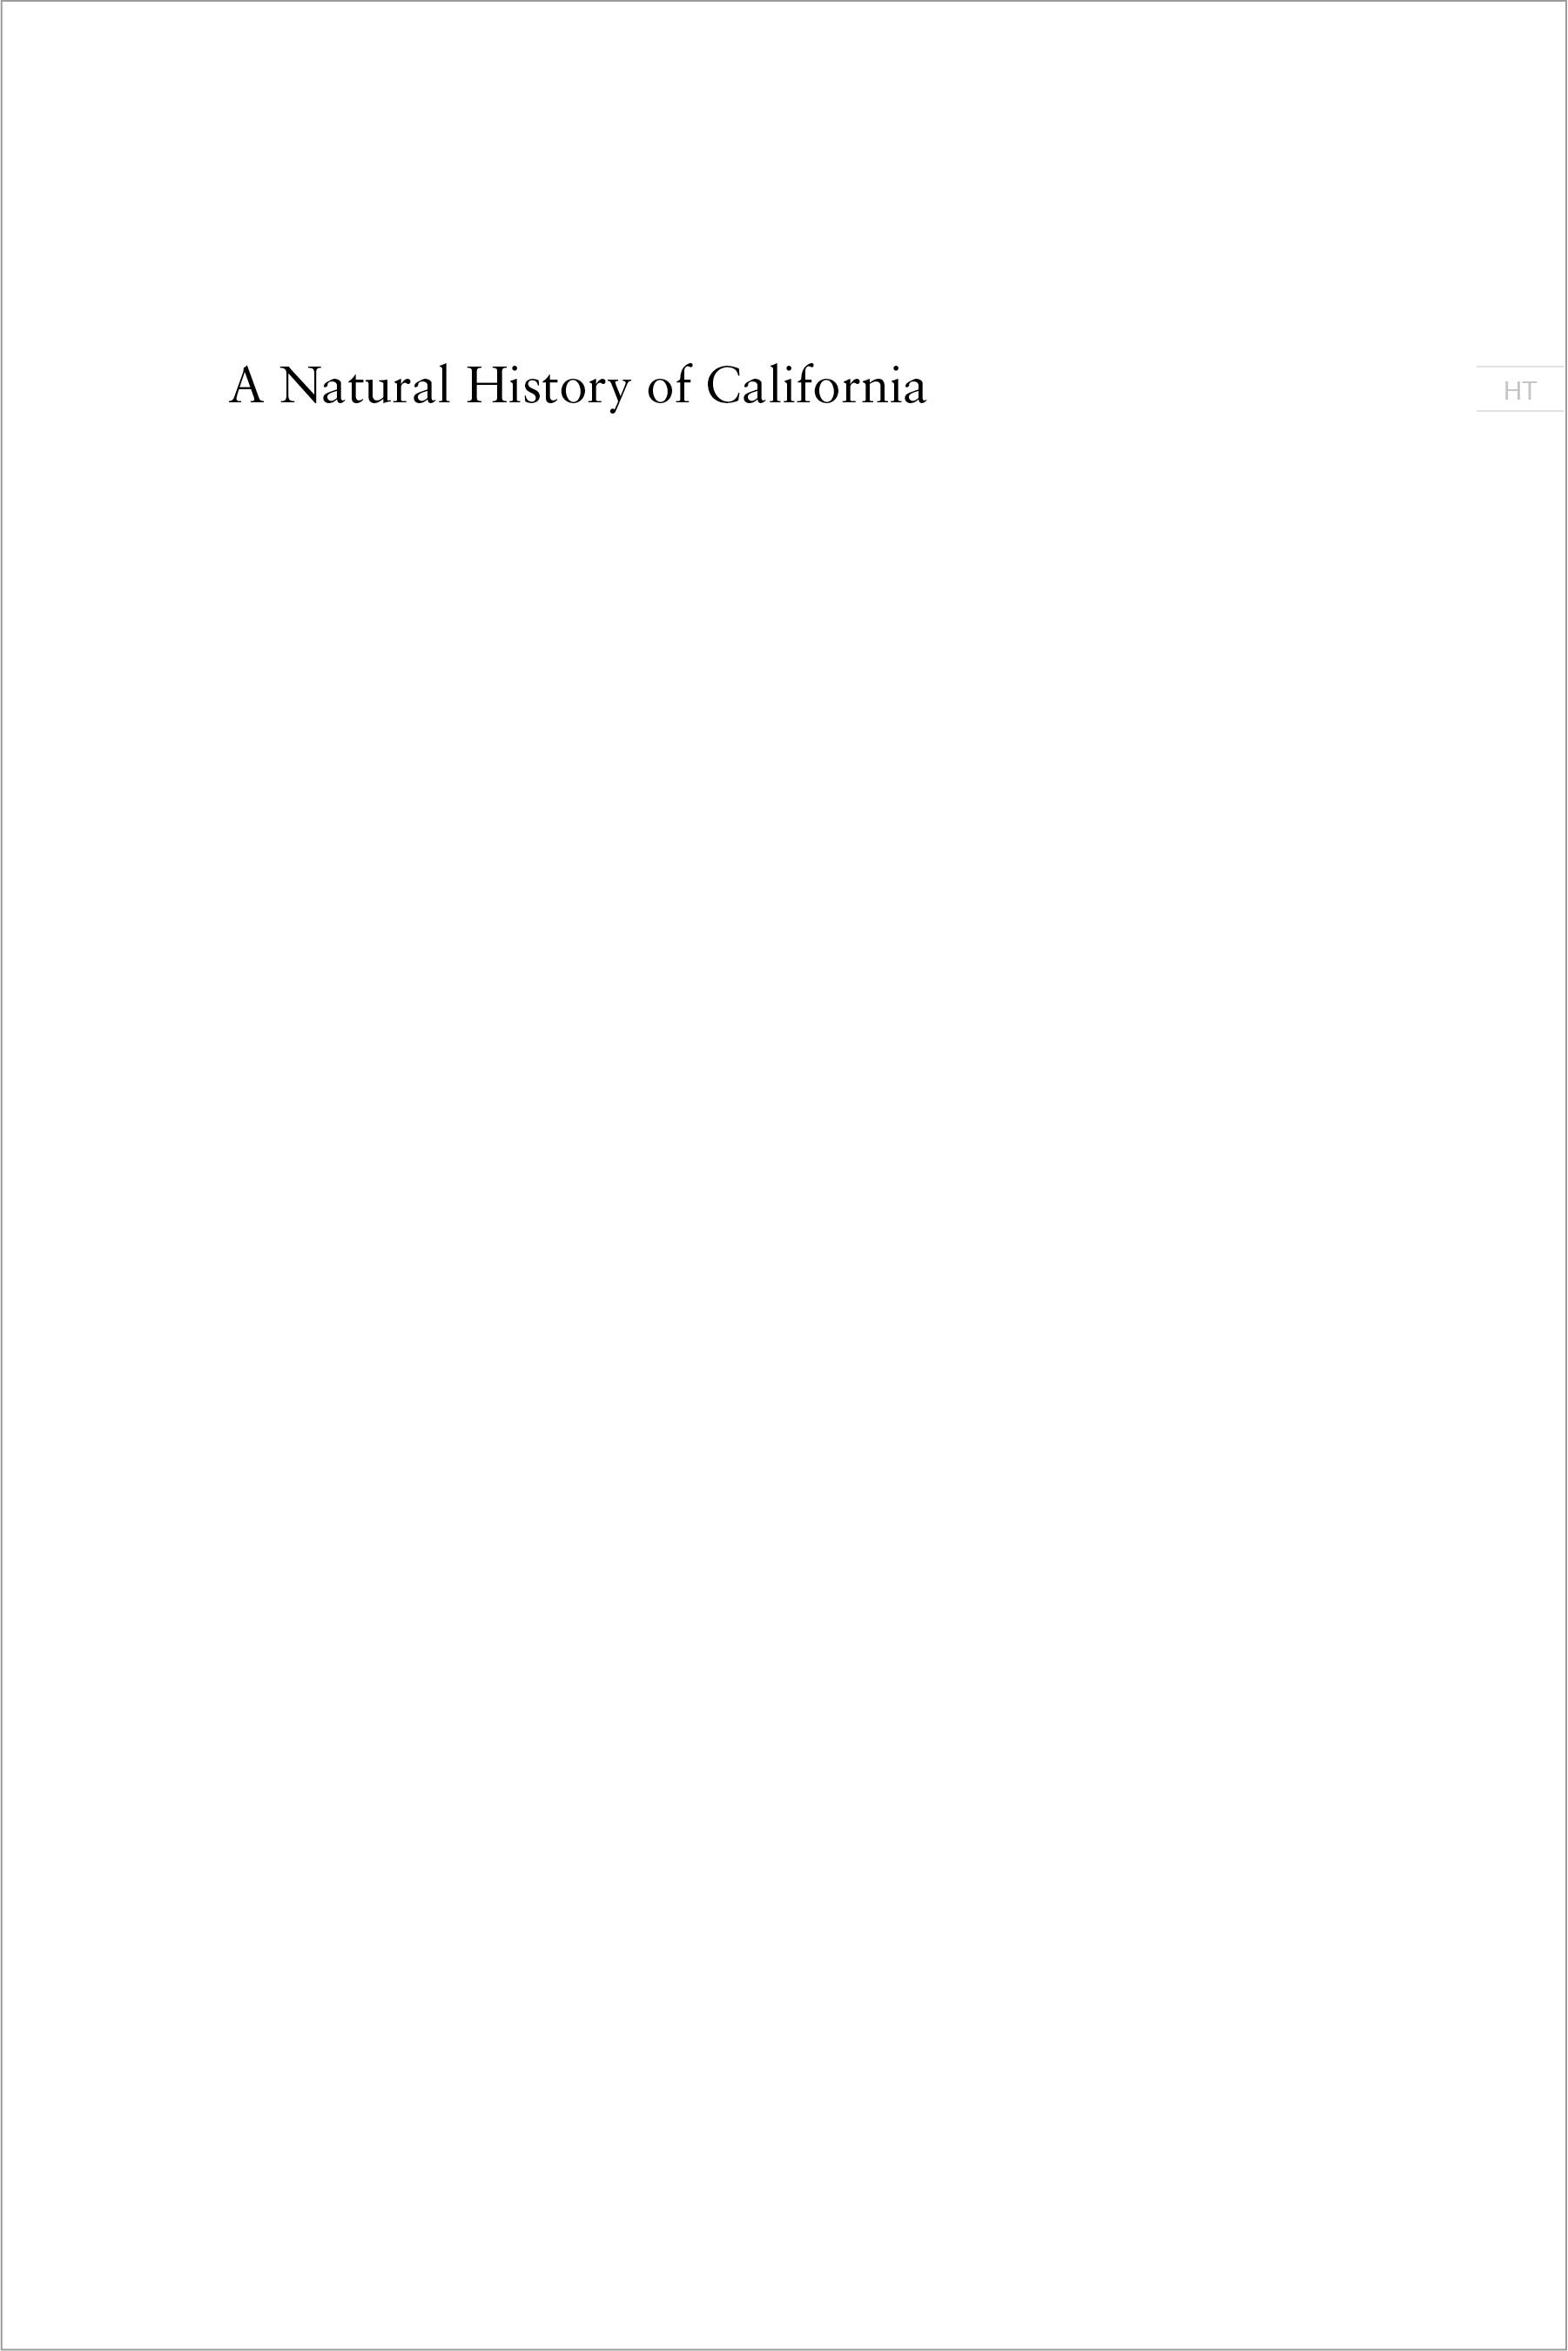 css/layouts/img/half-title.jpg